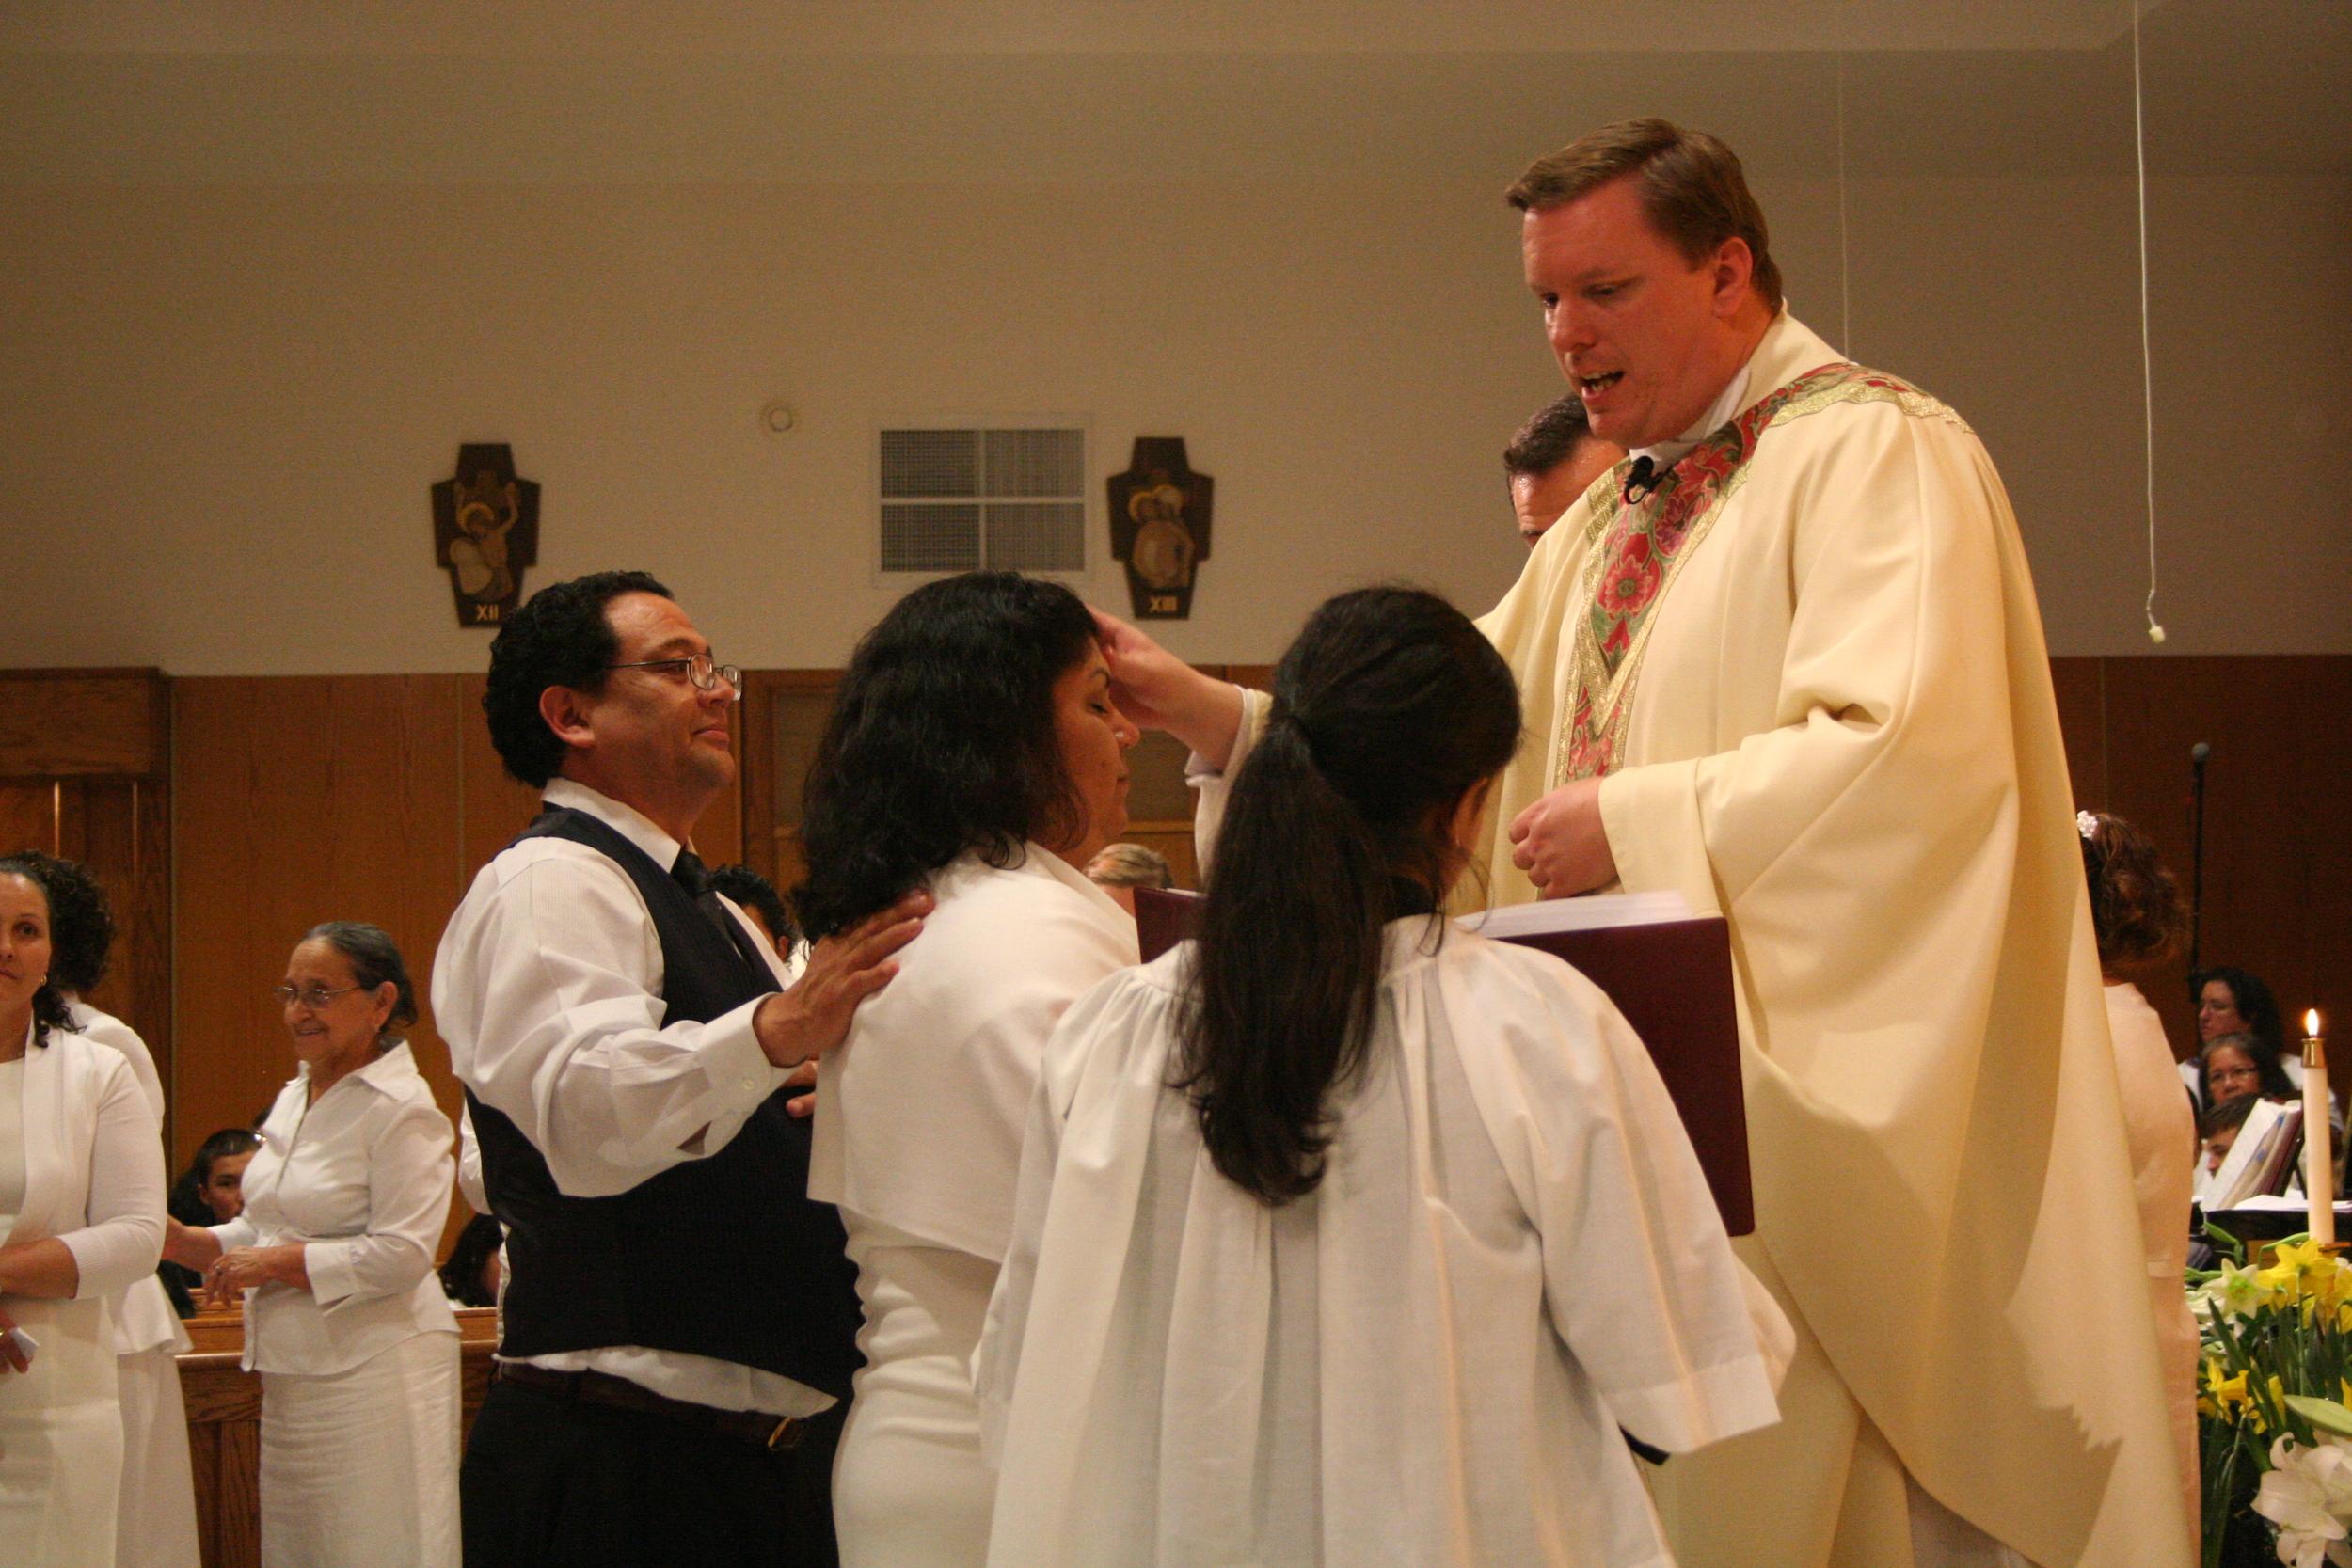 Fr. Mark S. Bialek, Pastor Emeritus, celebrates the Sacrament of Confirmation during the Easter Vigil.